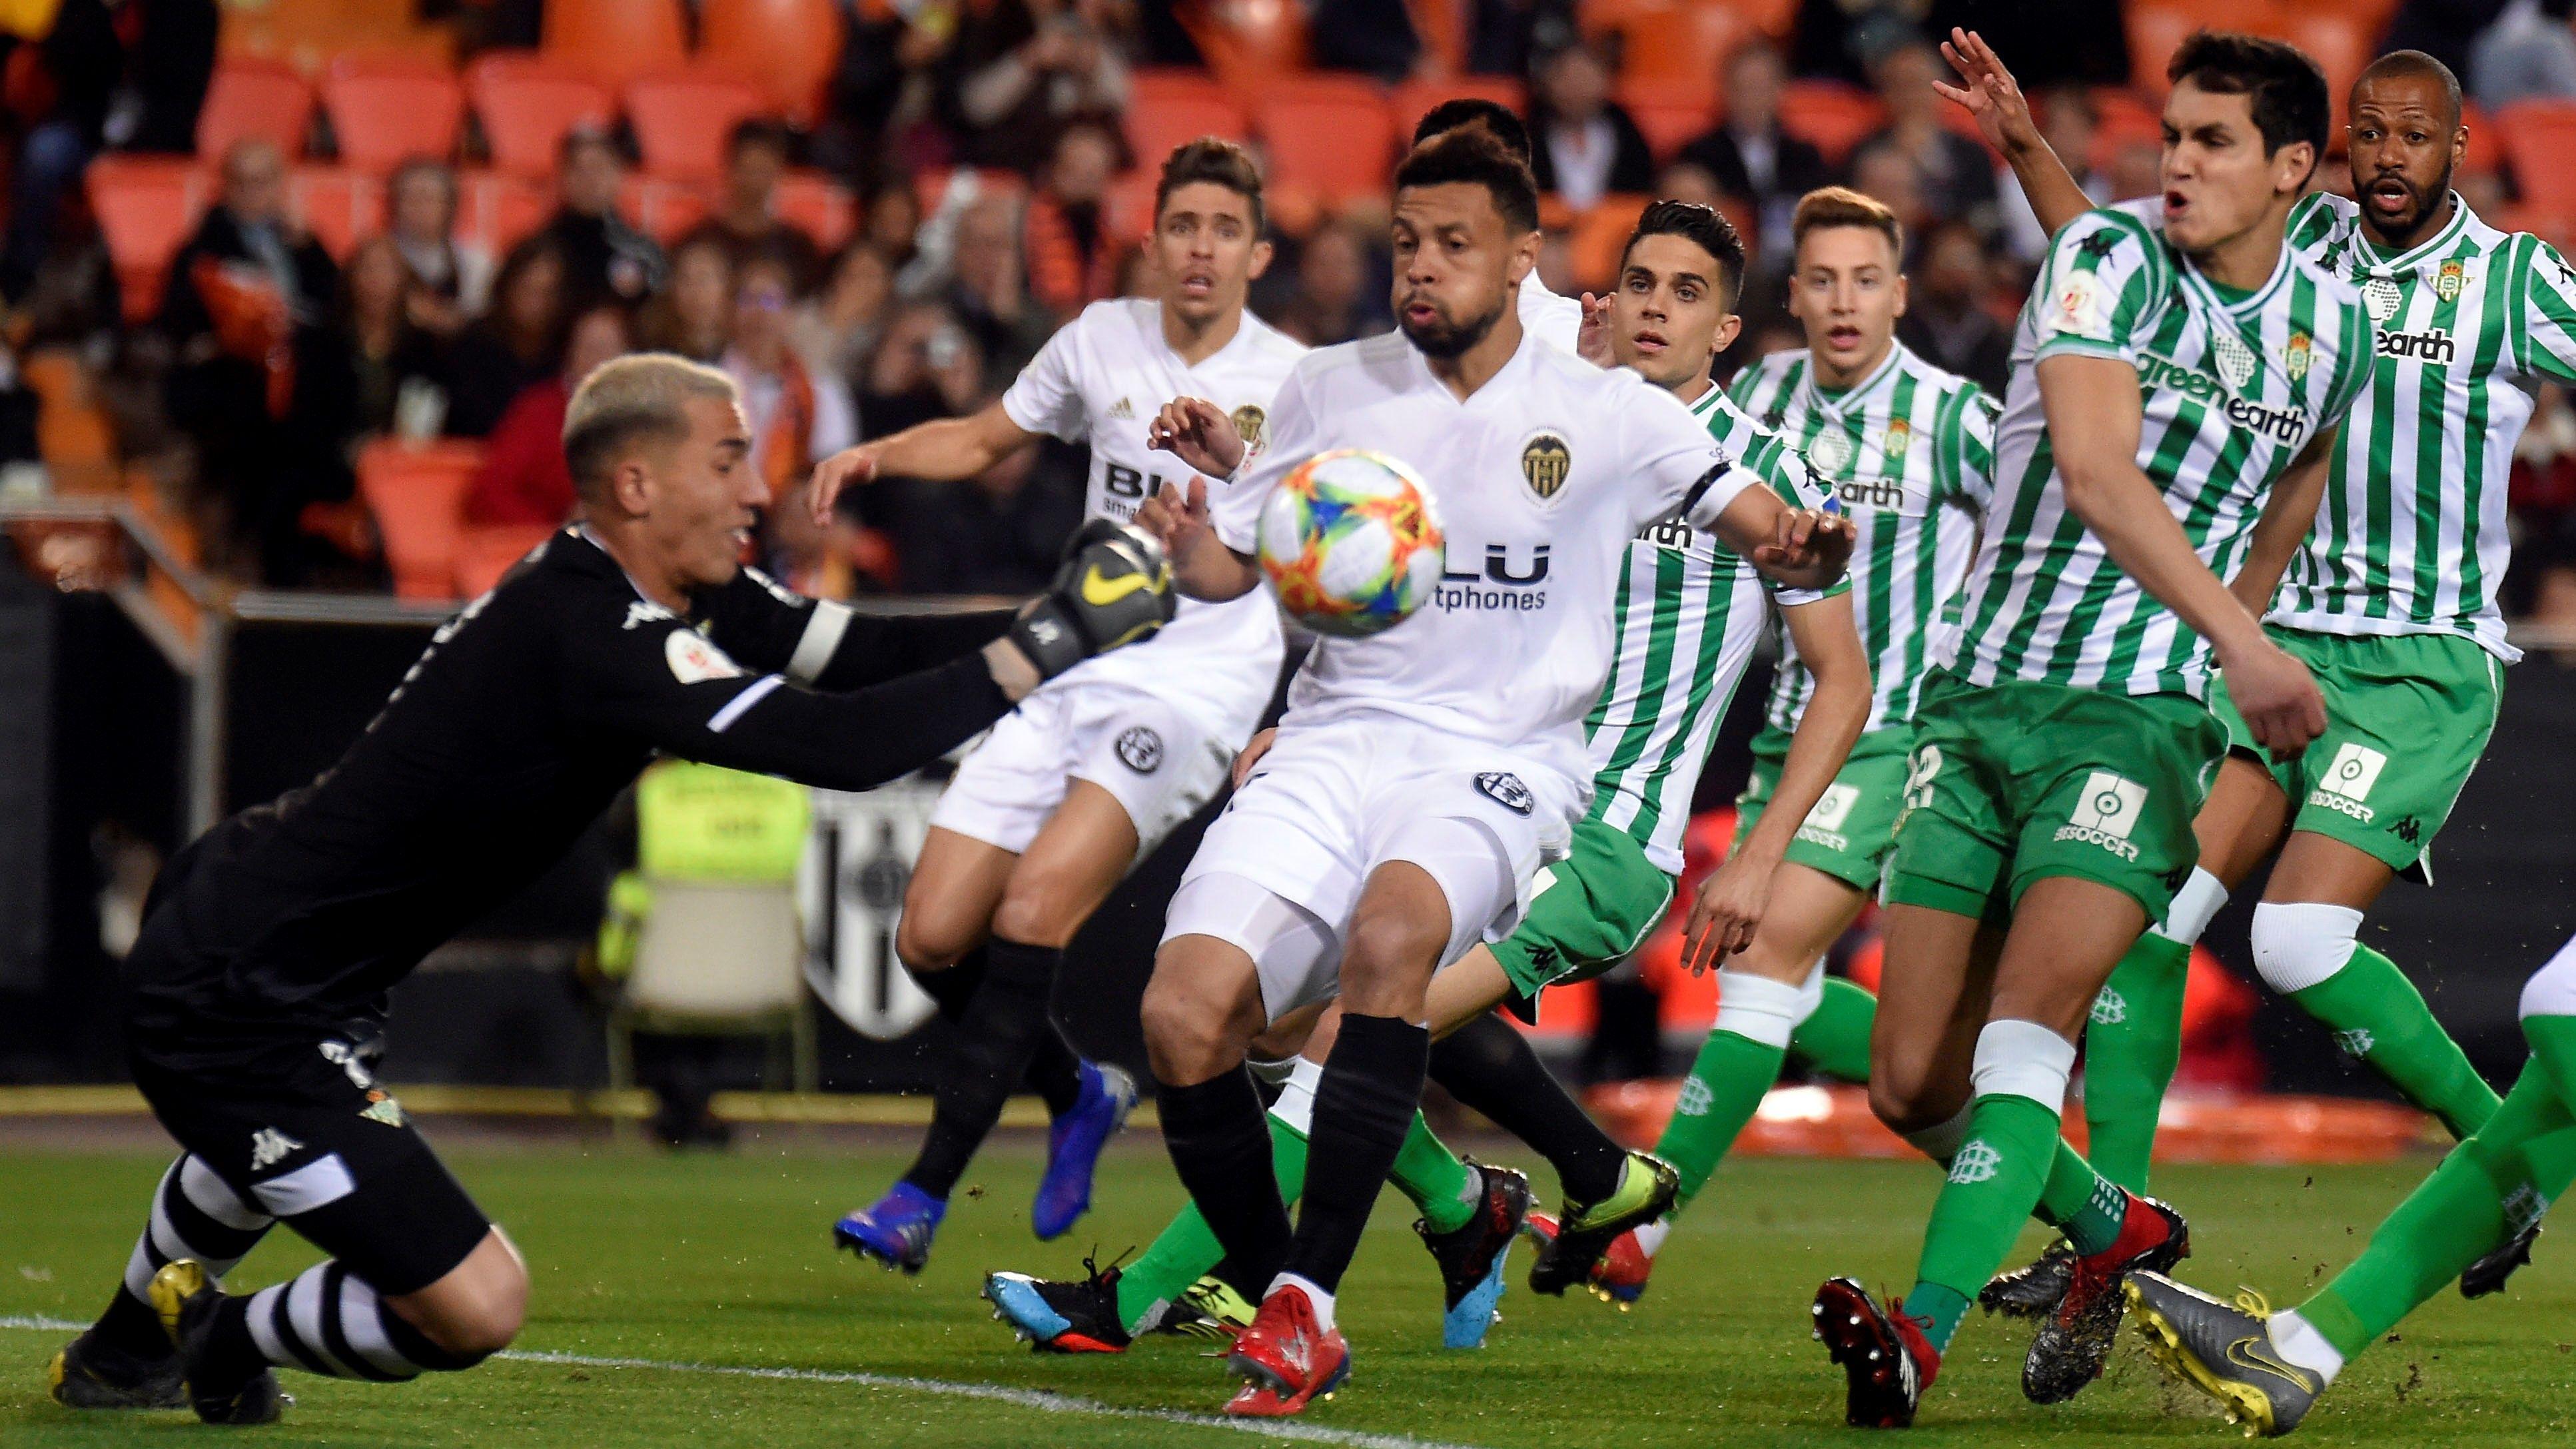 Levante Vs Real Betis En Vivo Minuto A Minuto 28 06 2020 Tarjeta Roja Futbol En Vivo Ver Partido